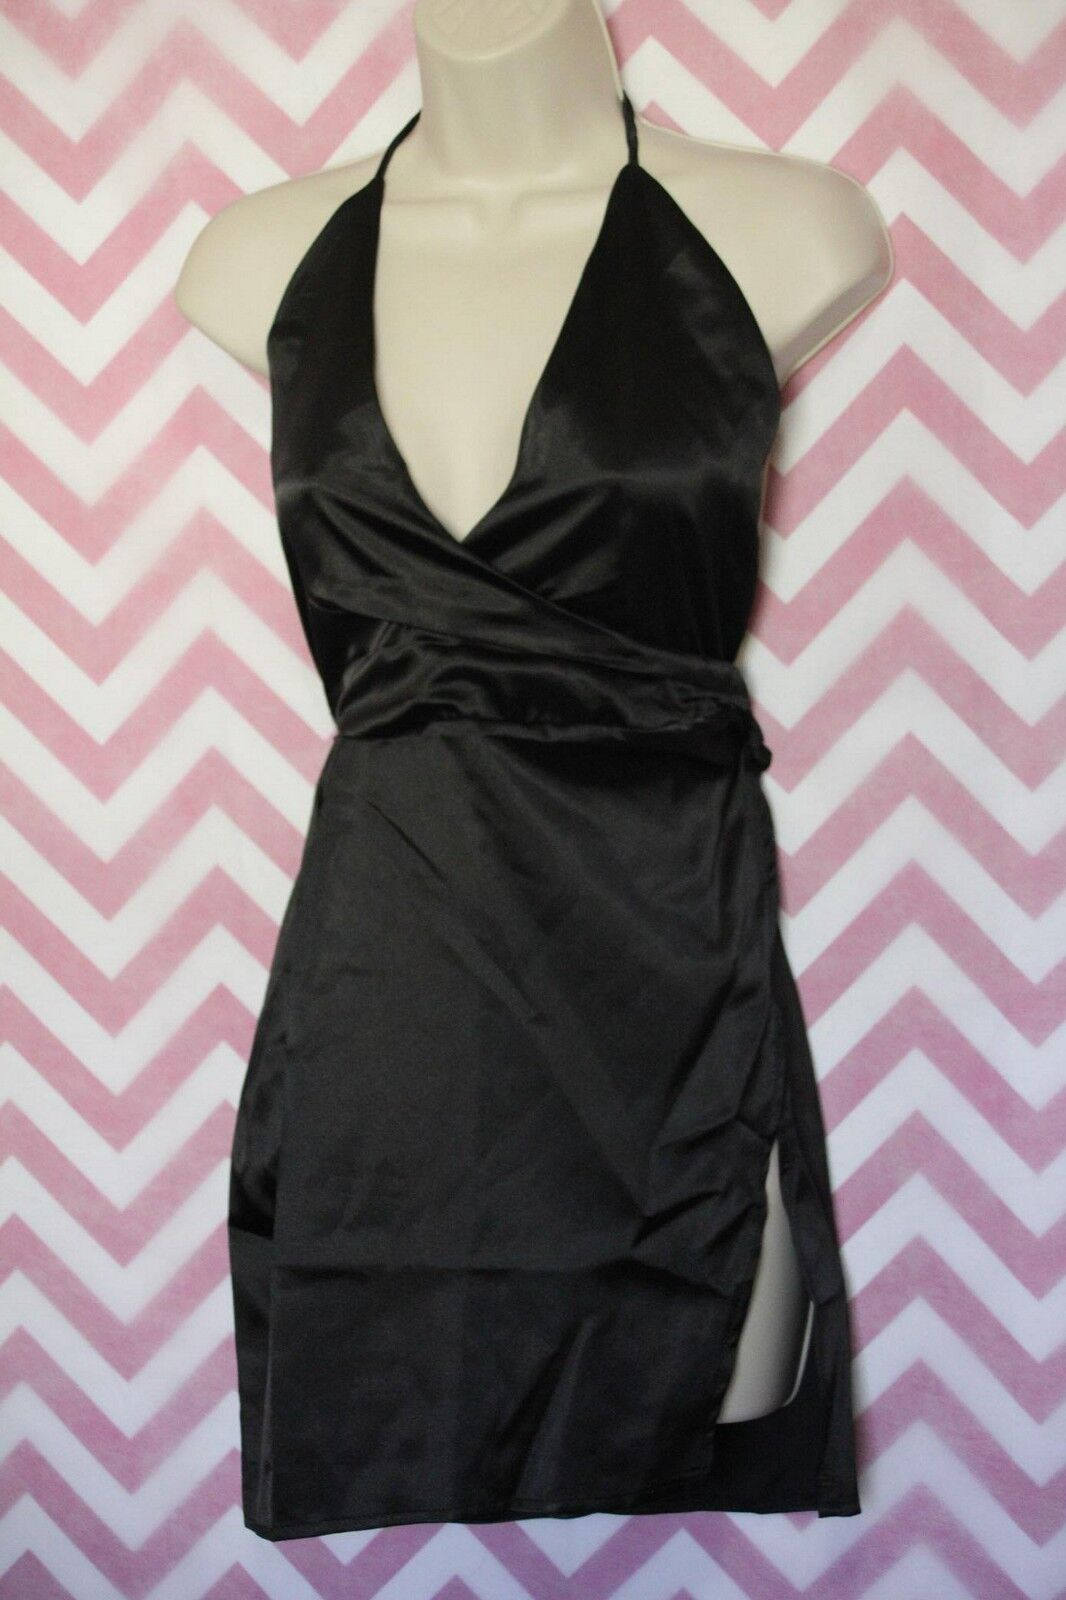 Купить Wanna This - NWT Wanna This Black Halter Dress Size XL China Runs Small Sexy Silky LBD